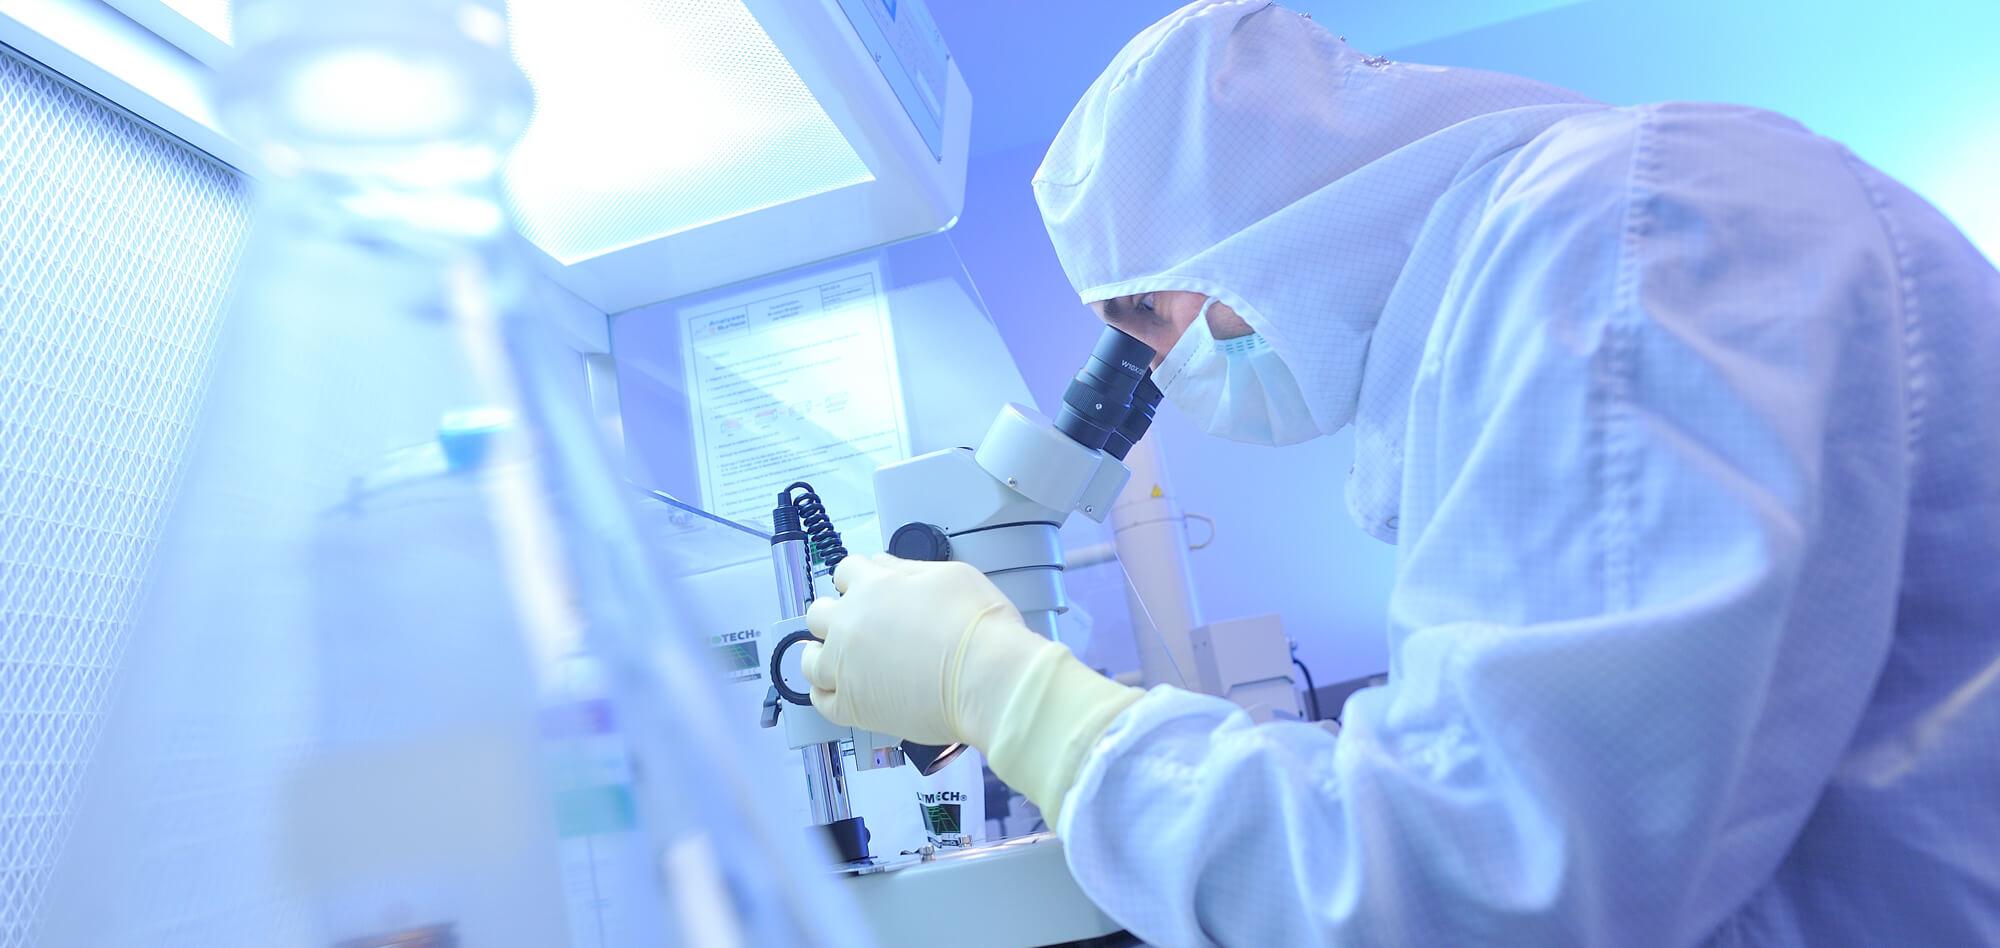 corps étrangers laboratoire analyse